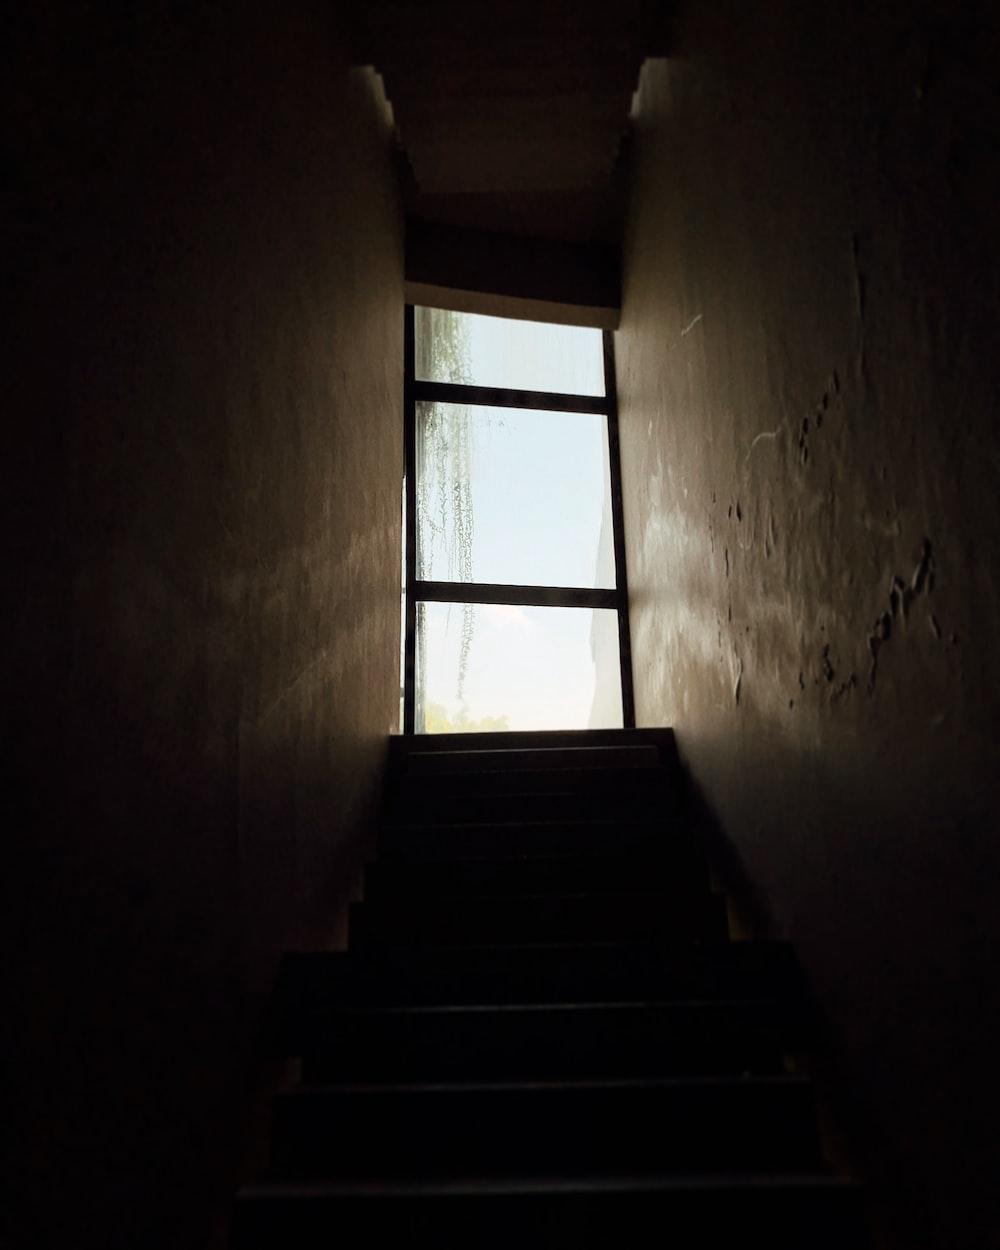 going upstair